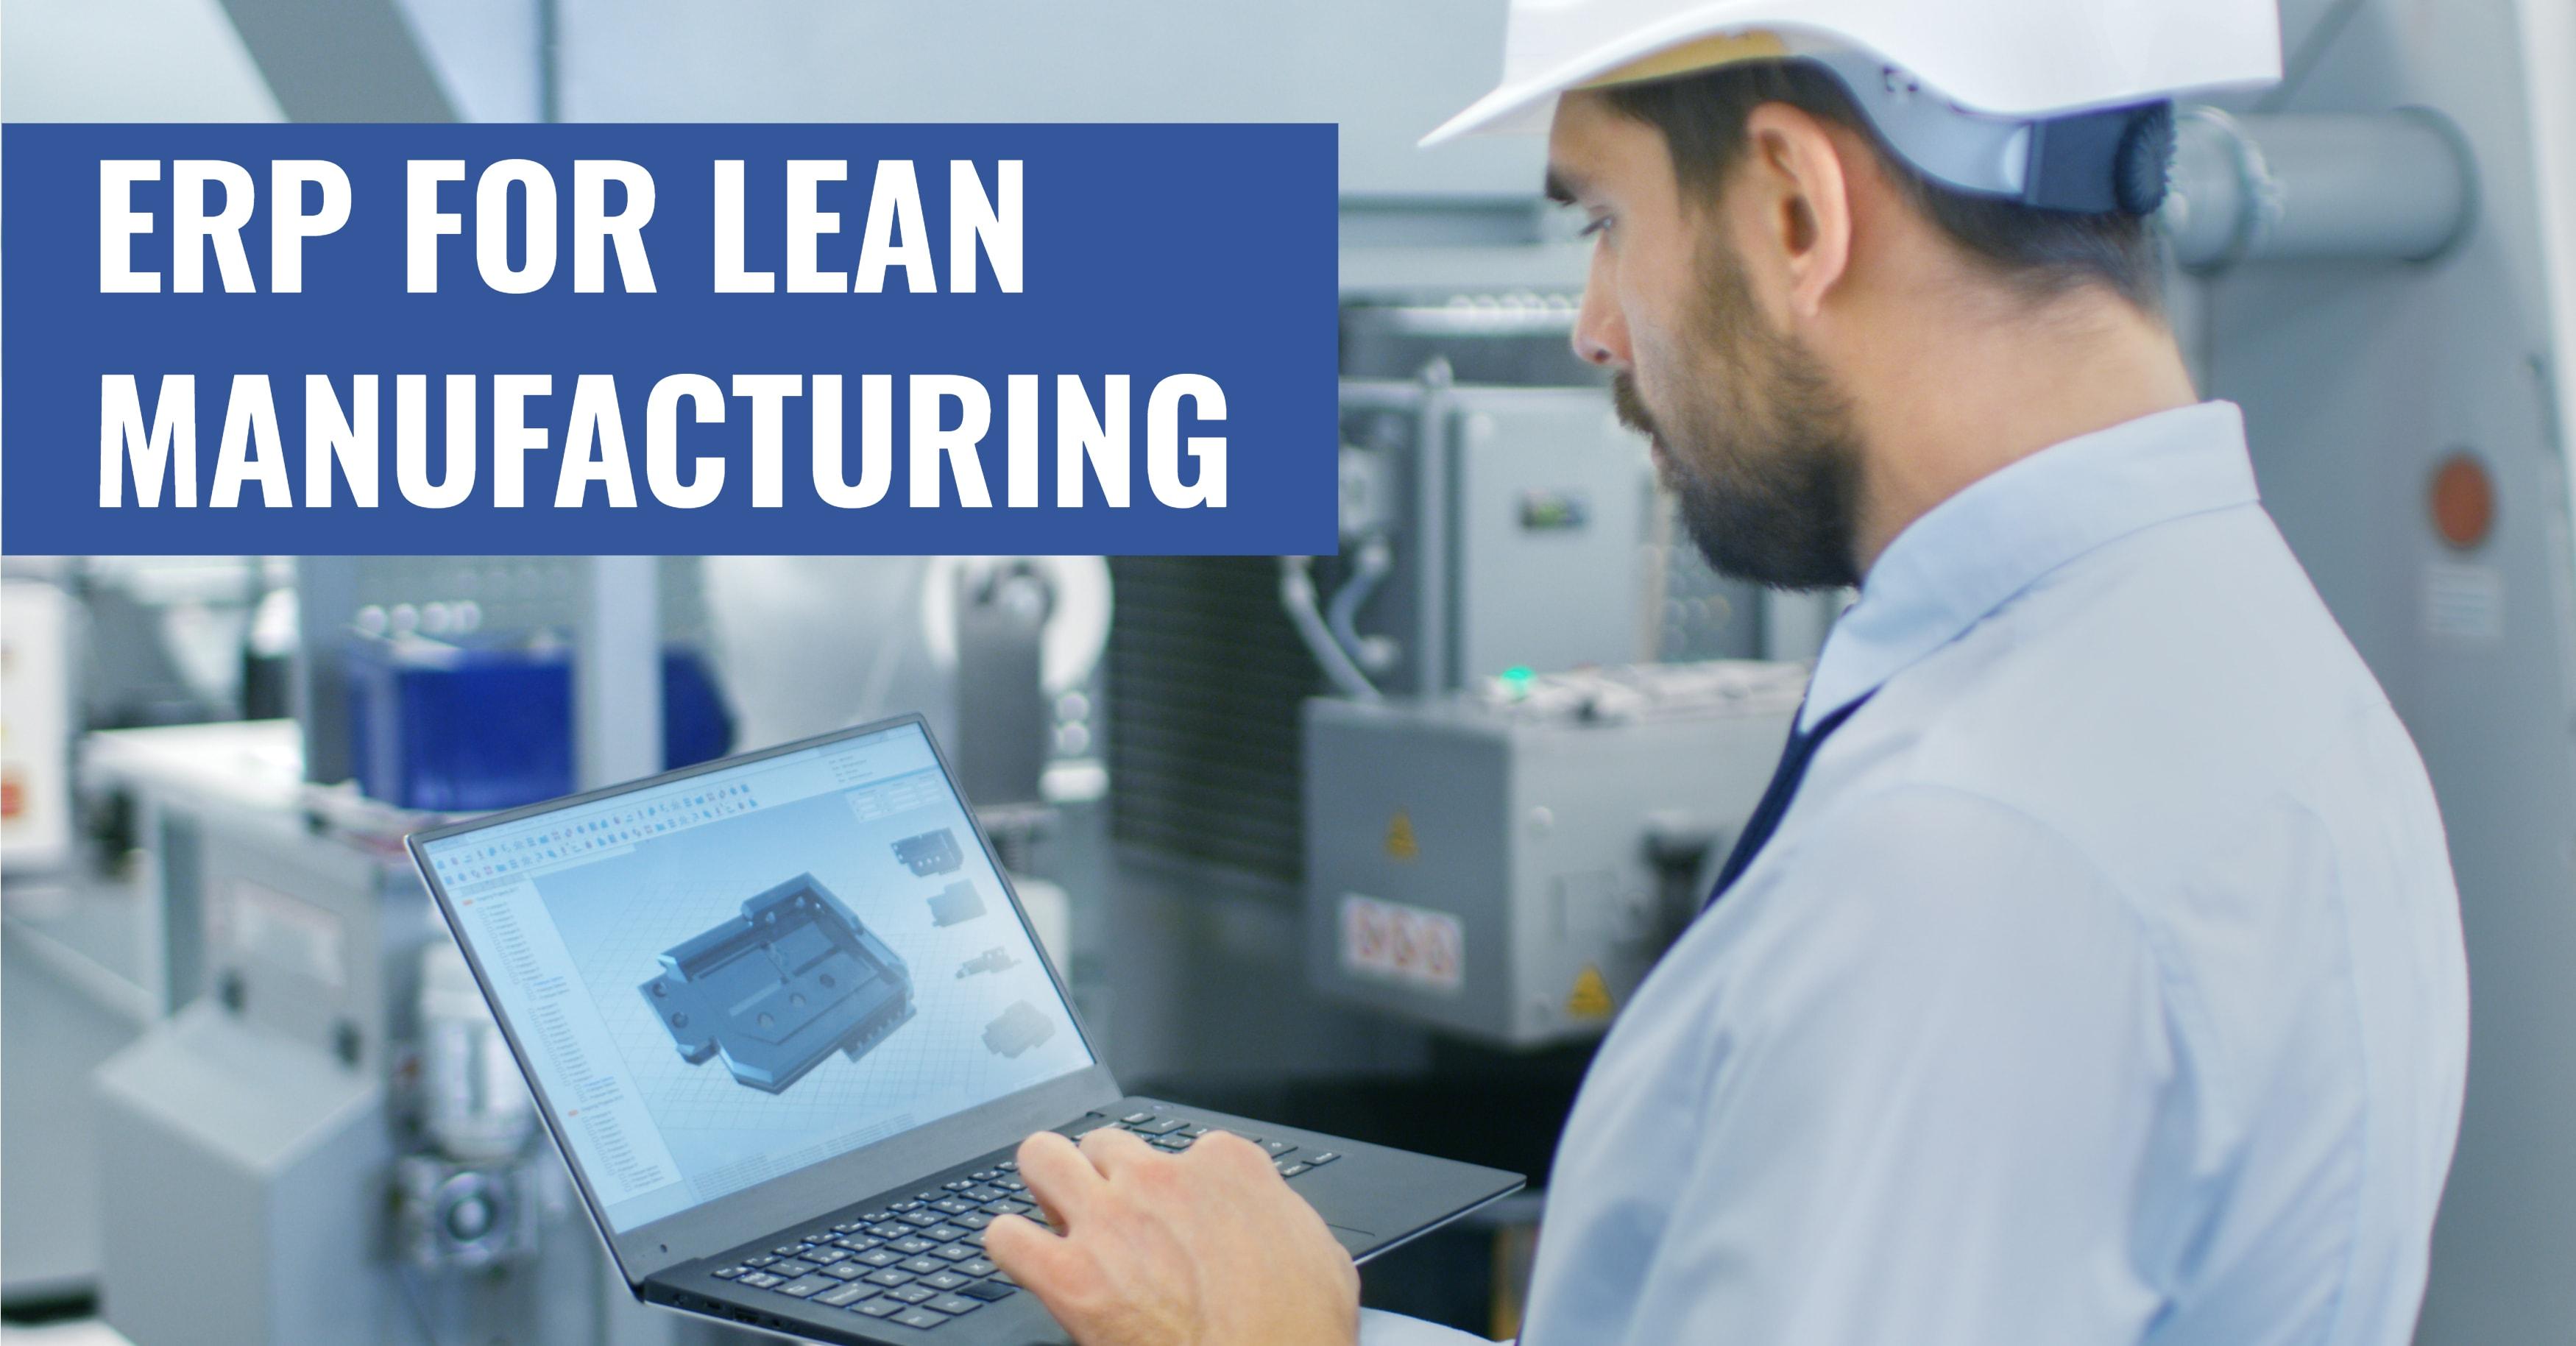 Lean Manufacturing ERP